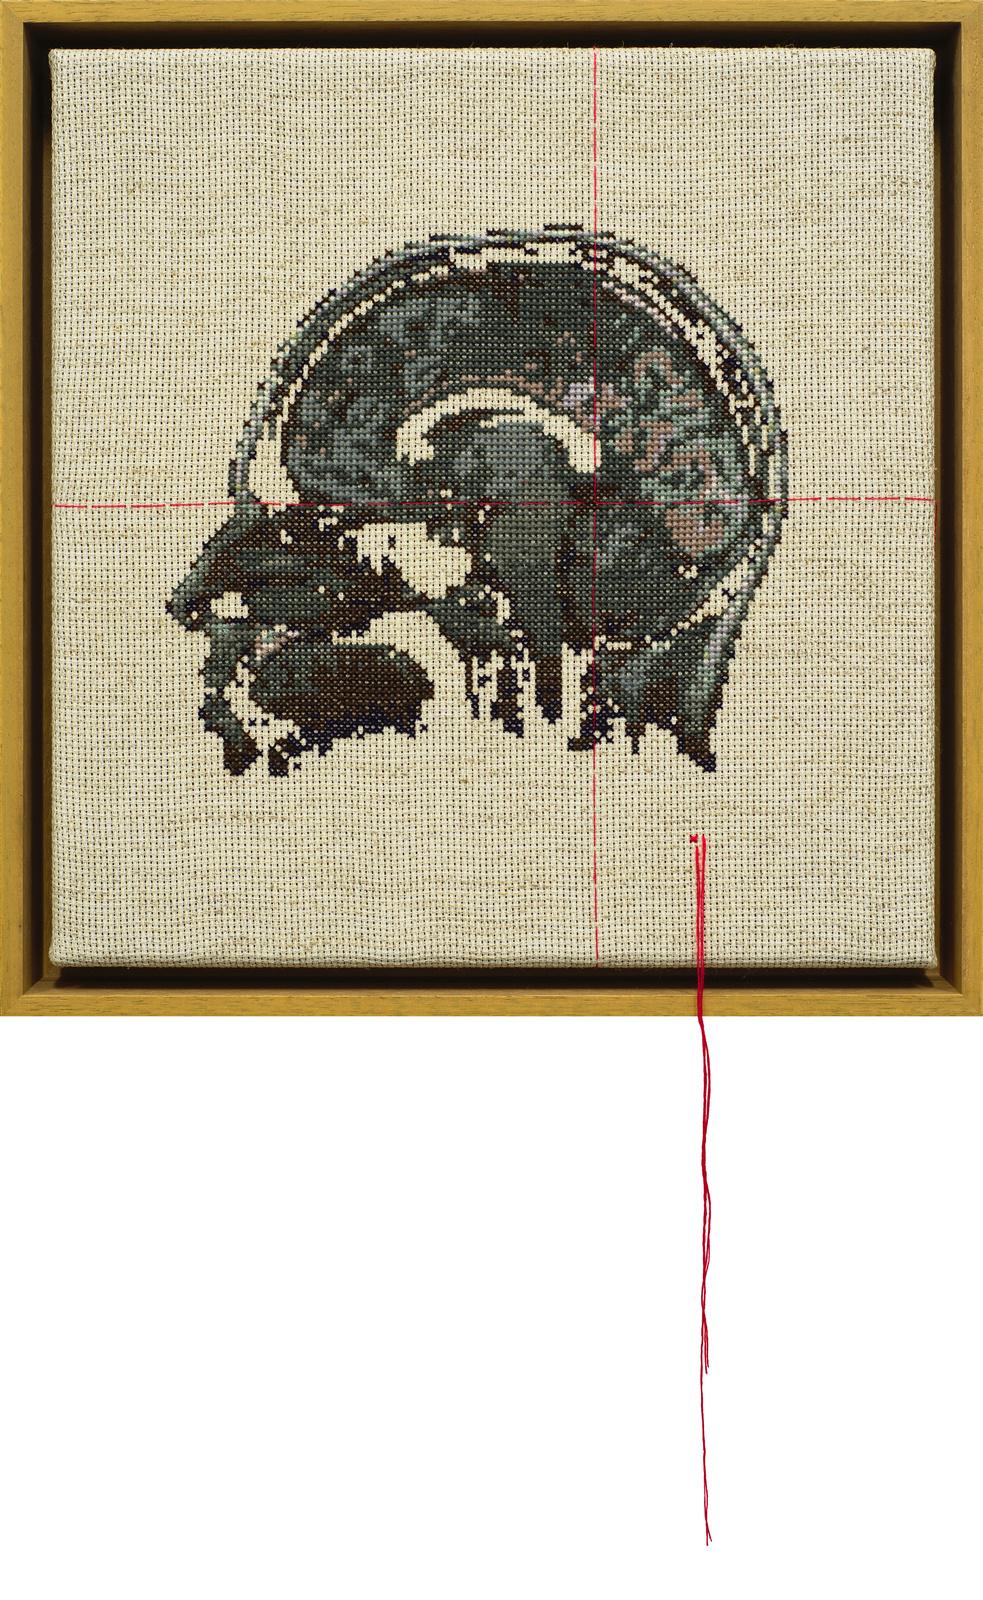 Self Portrait; Artist's Brain Stranded cotton on aida cloth, 2010 300 x 290 mm    photo Bob Newman